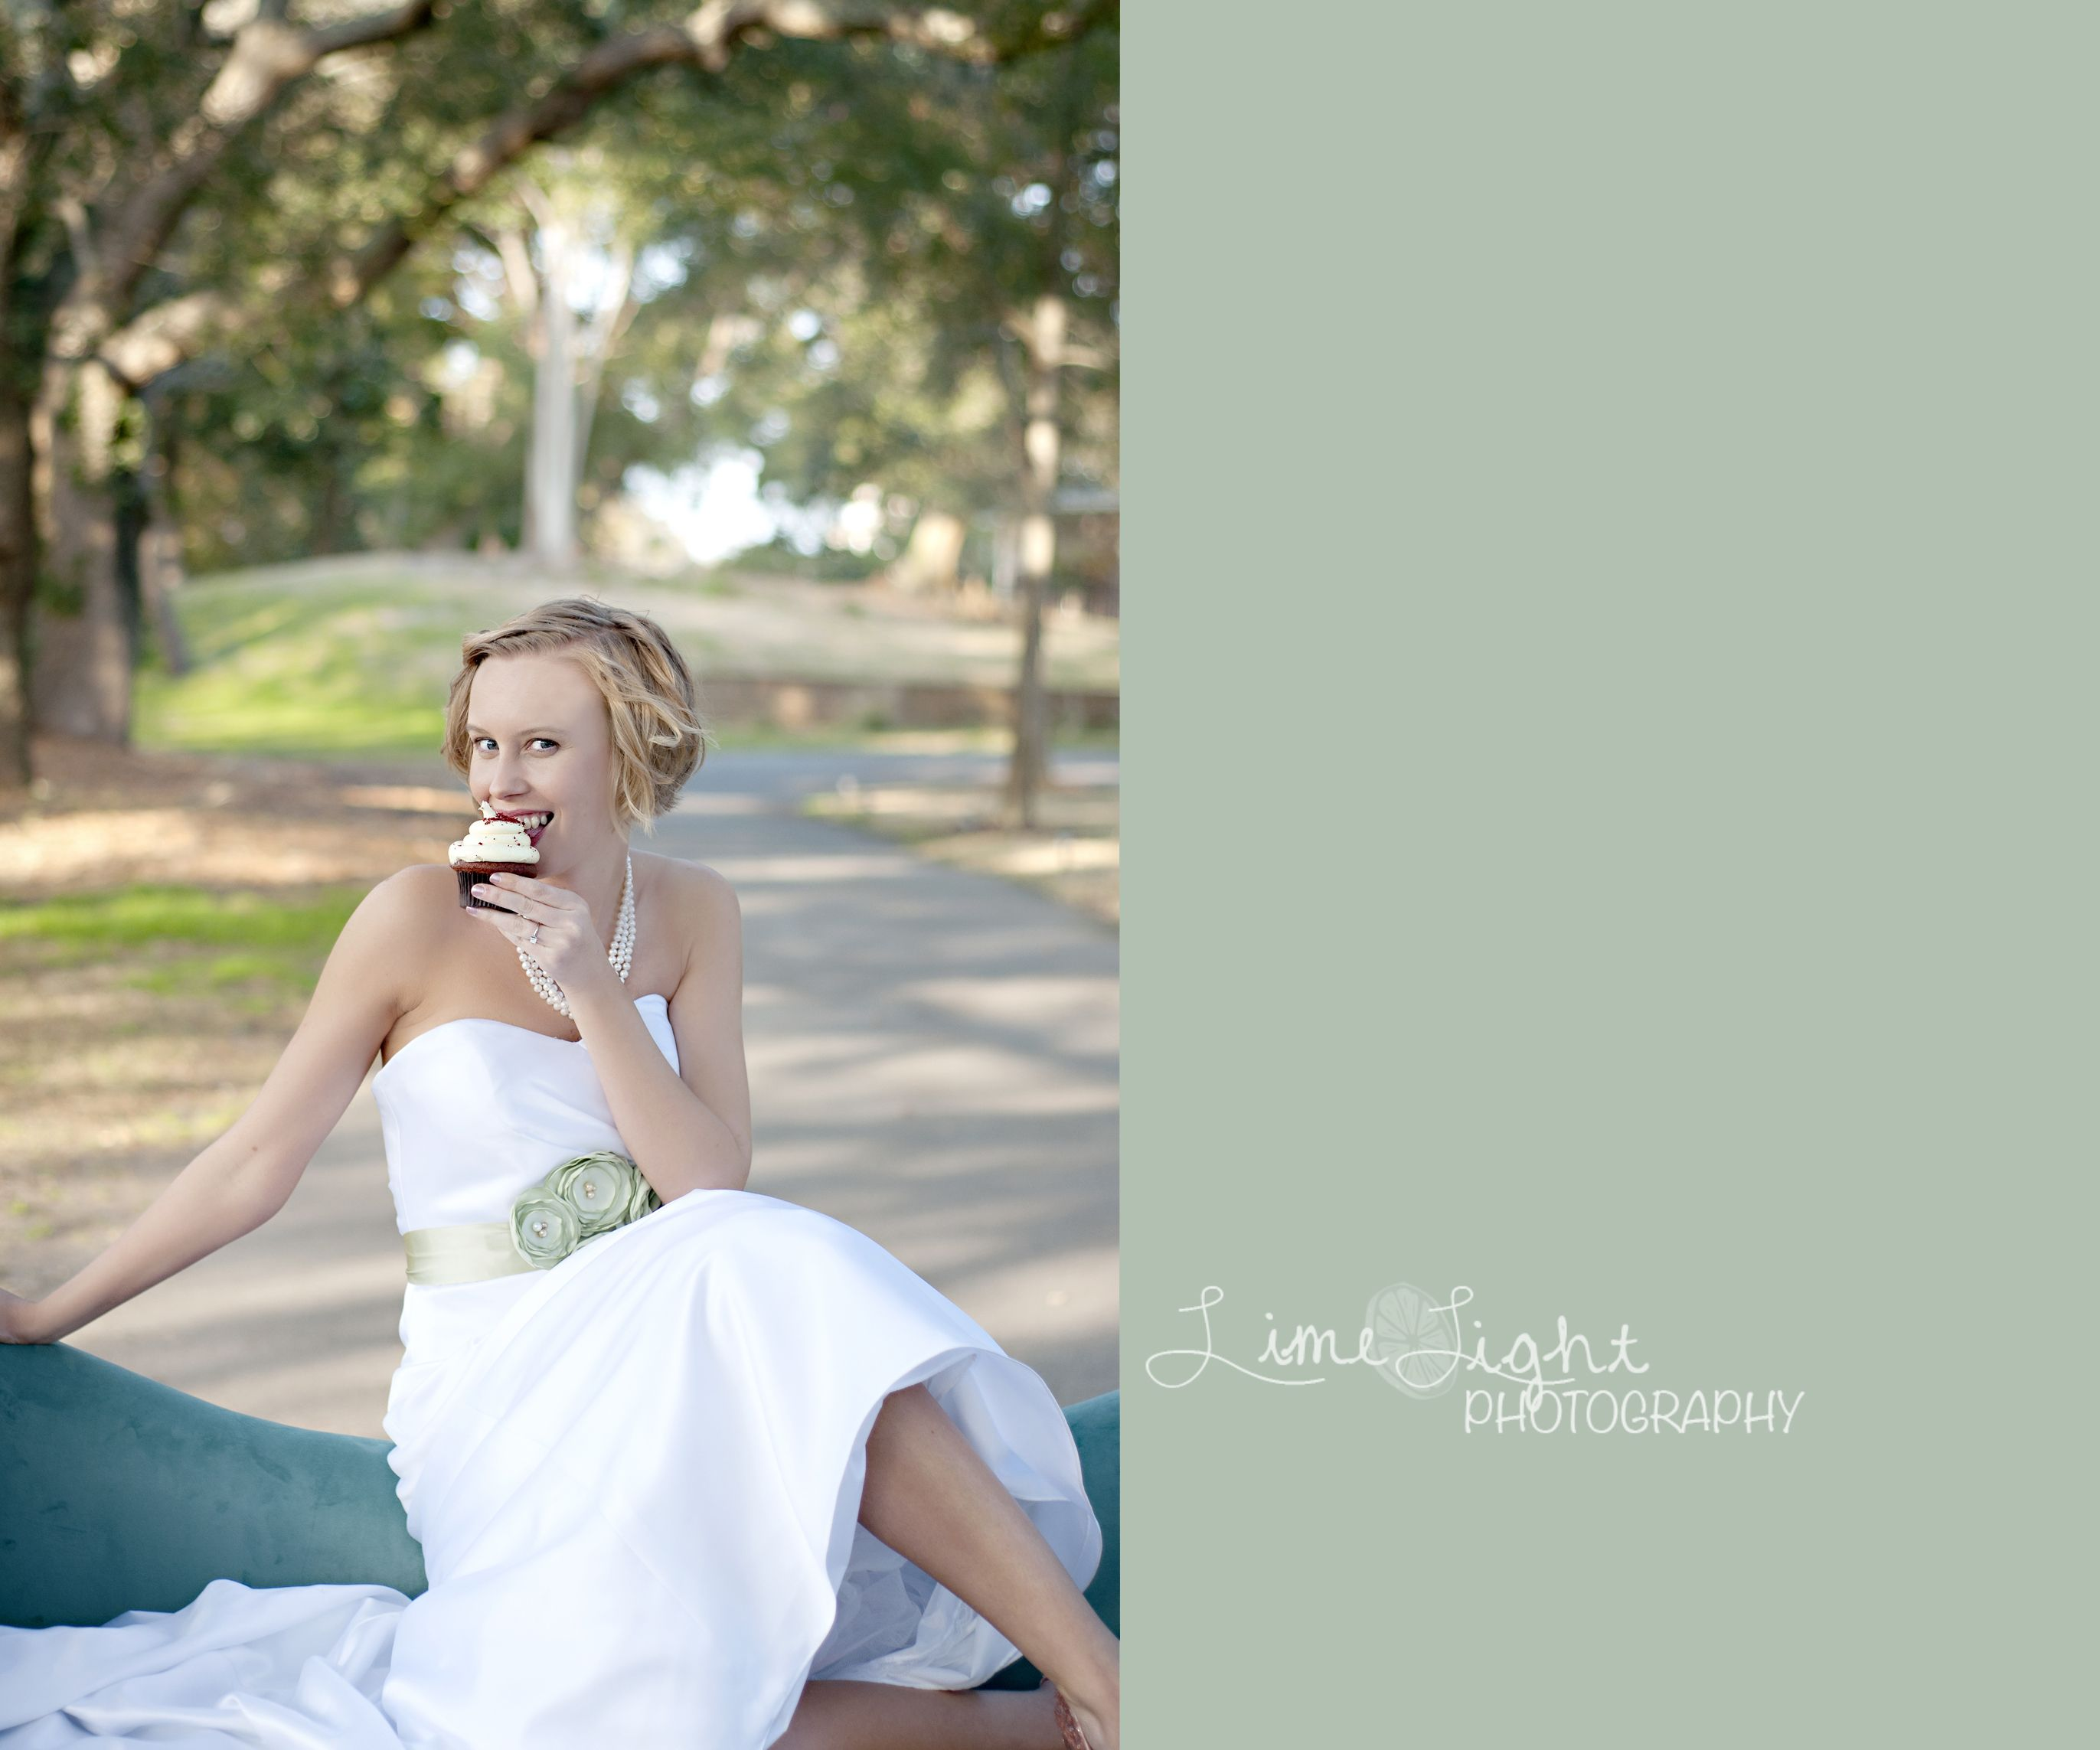 Cupcake bride outdoor bridal portrait wedding dress lime light